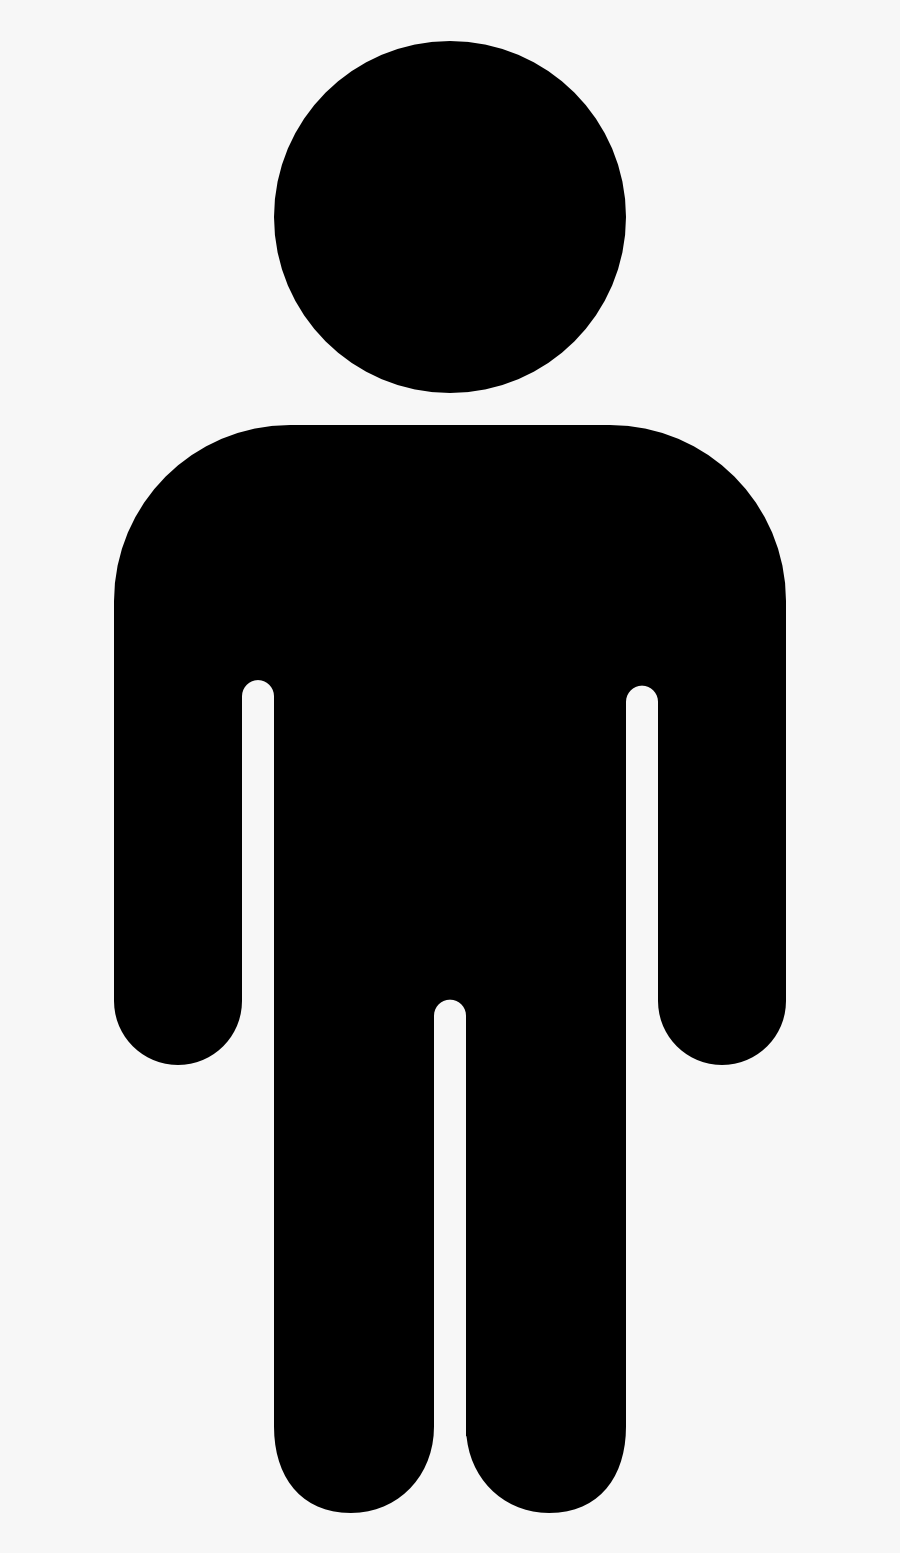 Male Clip Art at Clker.com - vector clip art online, royalty free & public  domain